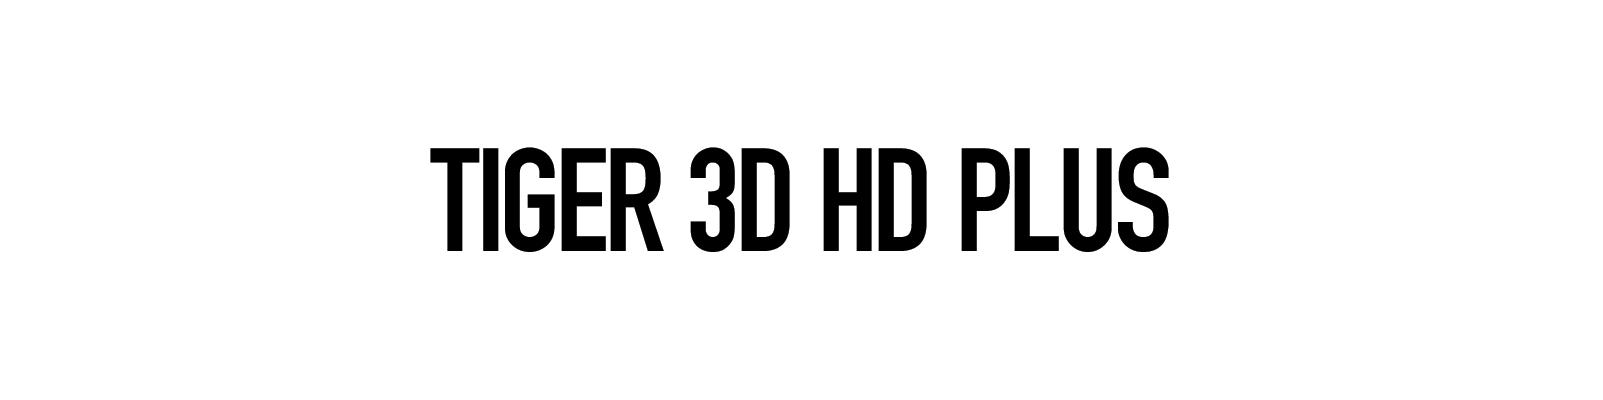 Tiger3D Printer - HD PLUS